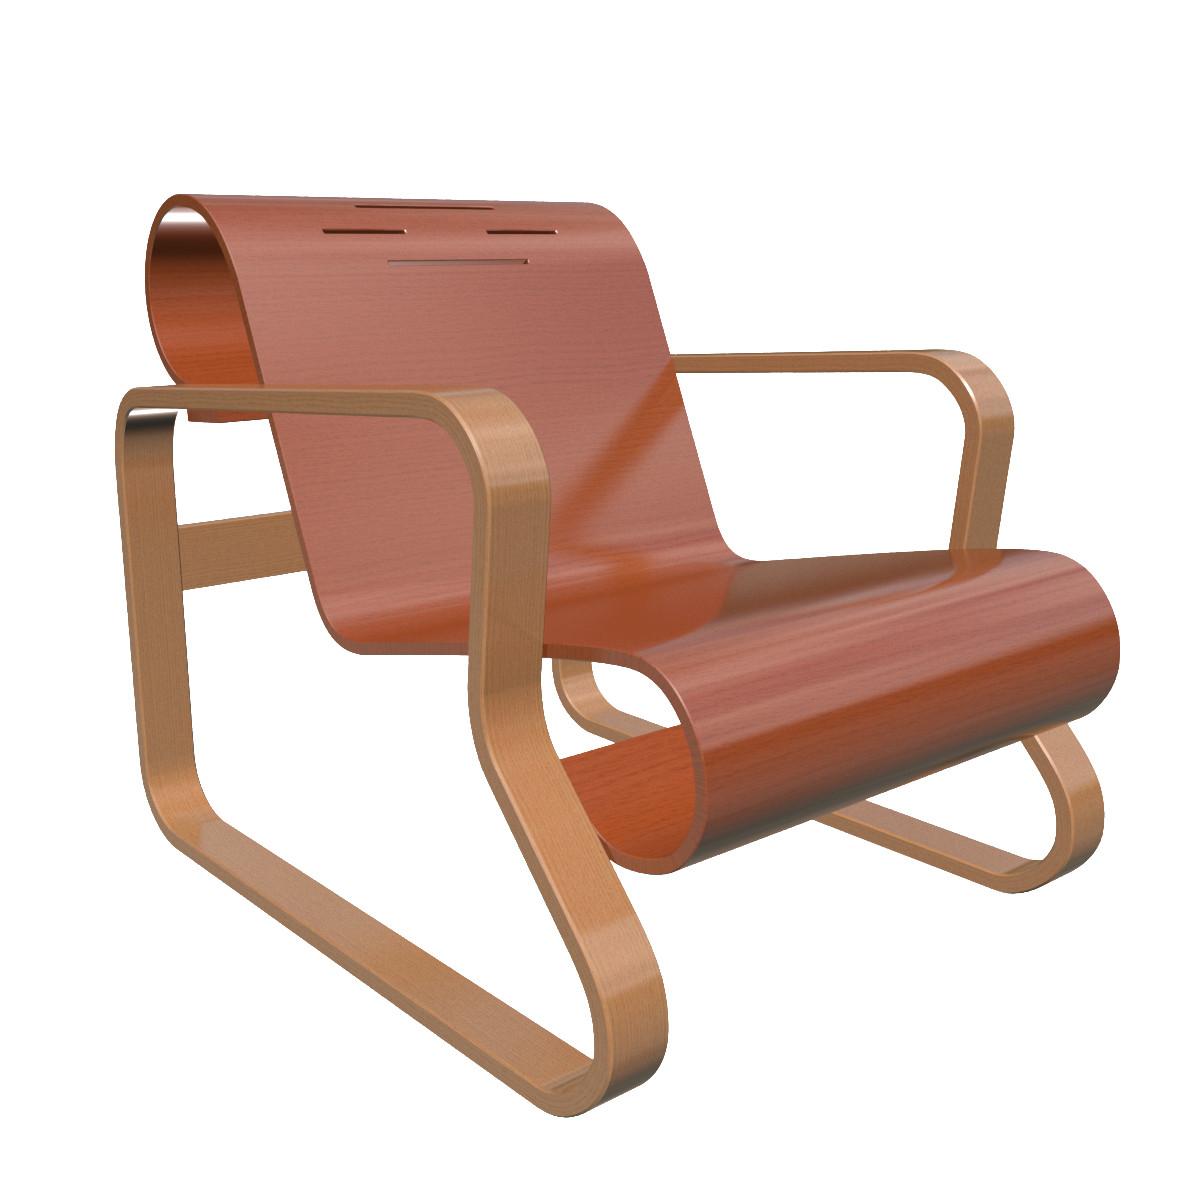 360 Artek_Chair0000.png